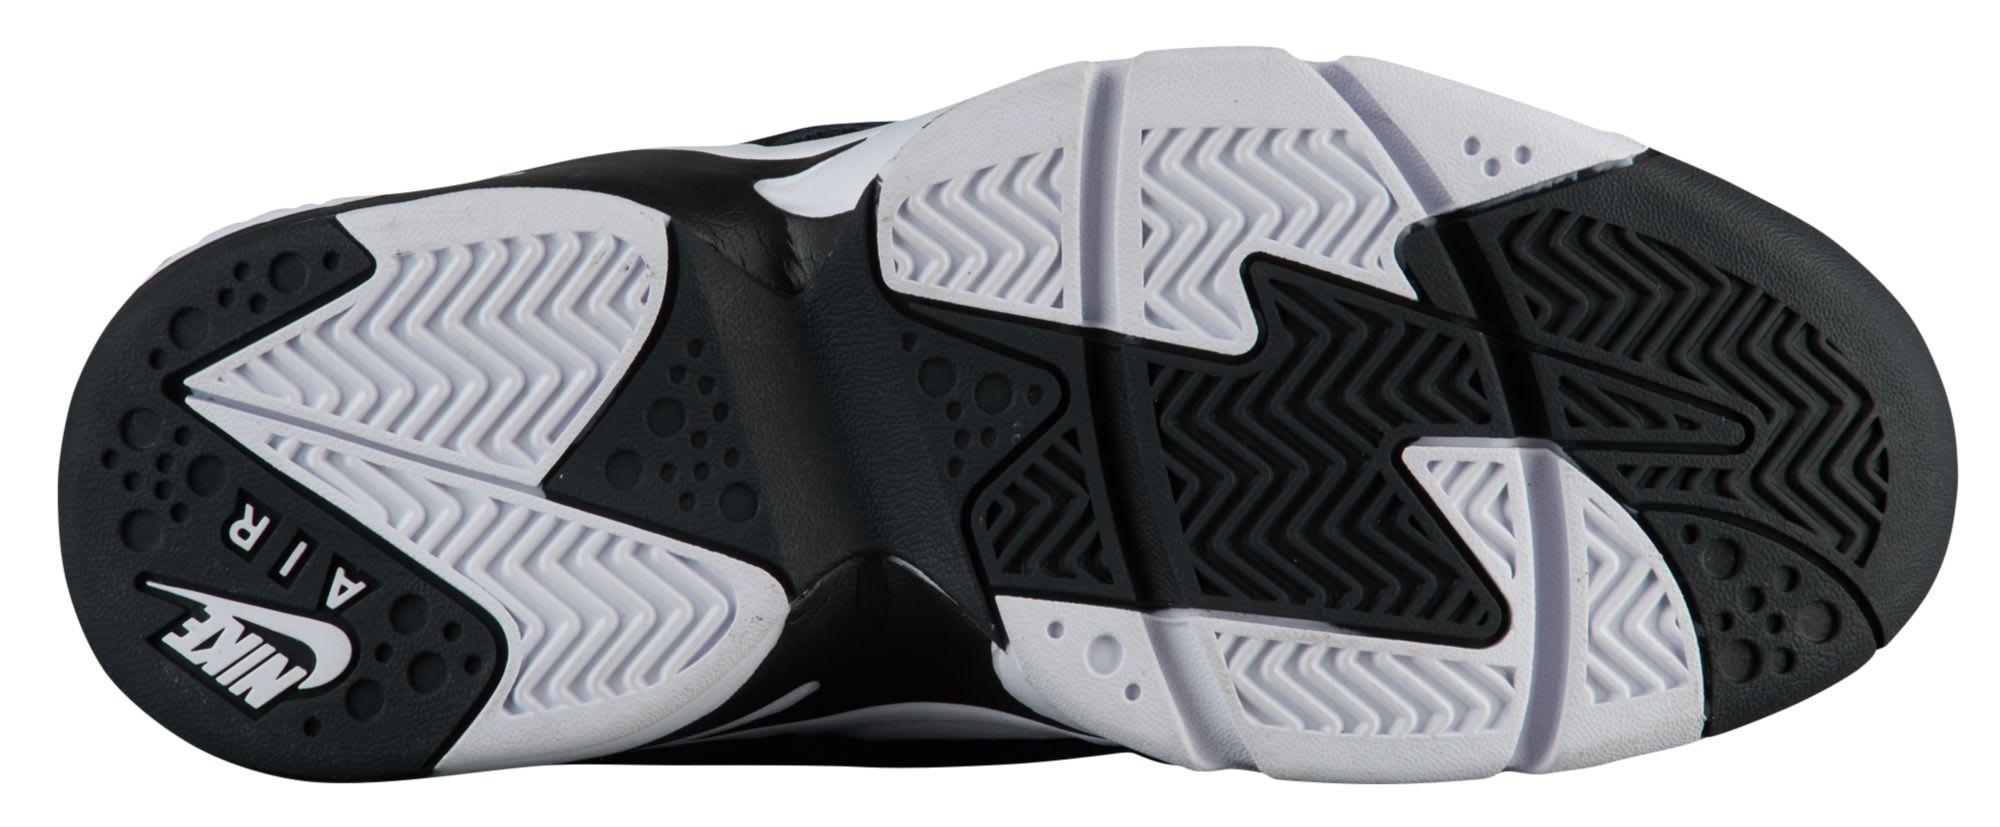 Nike Air Maestro 2 LTD Black/White Release Date AH8511-001 Sole